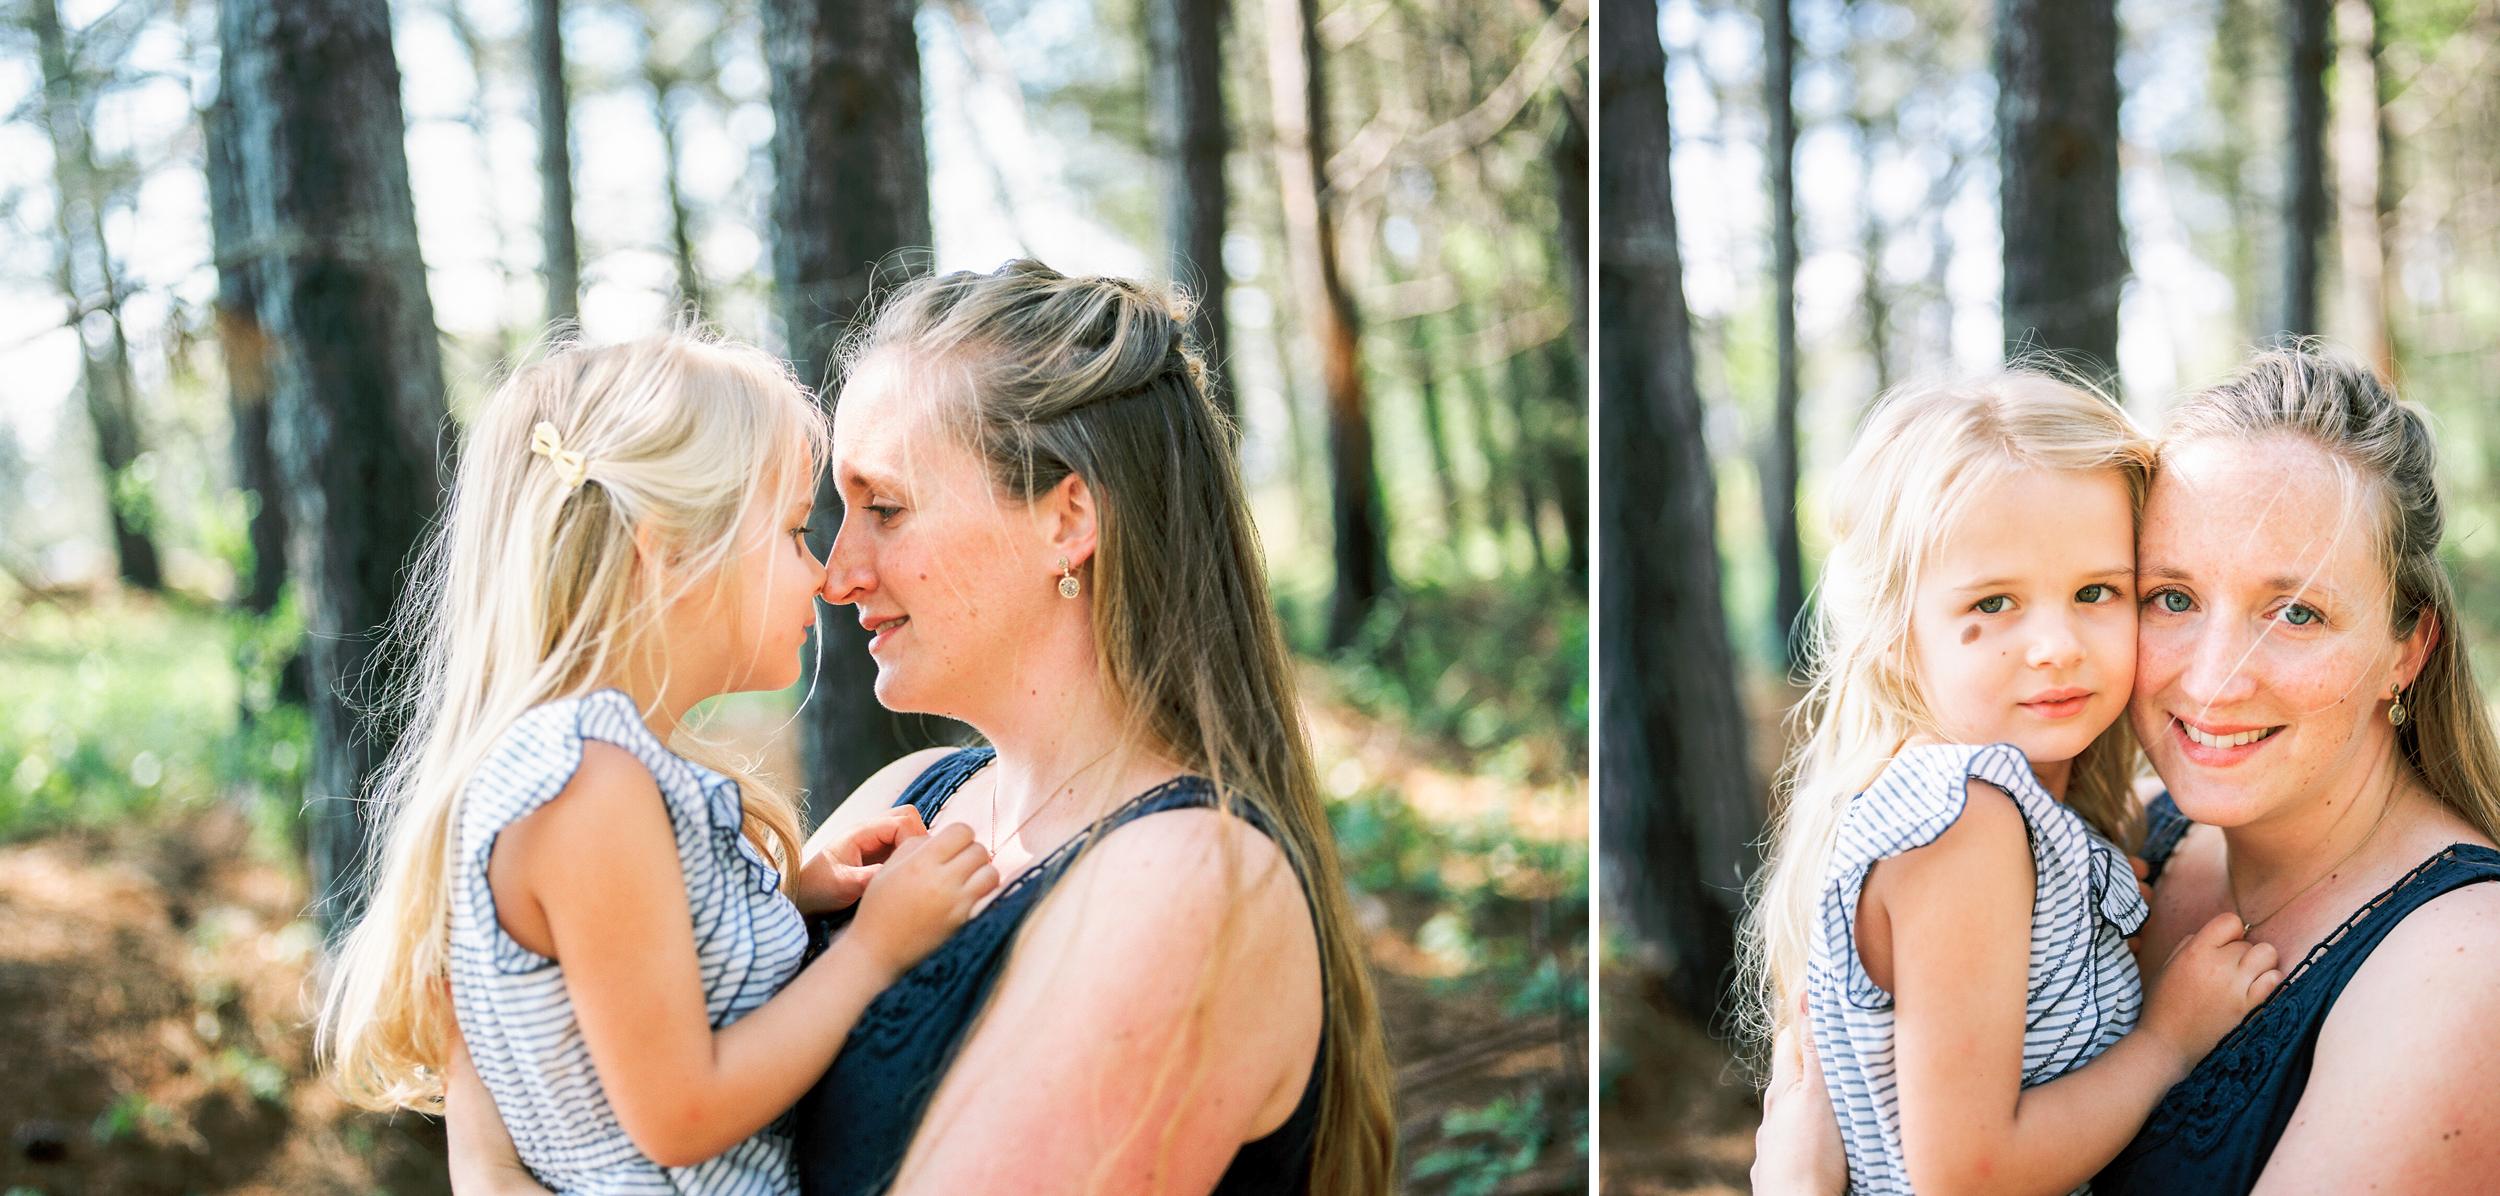 081-athens-georgia-children-and-family-film-photographer.jpg